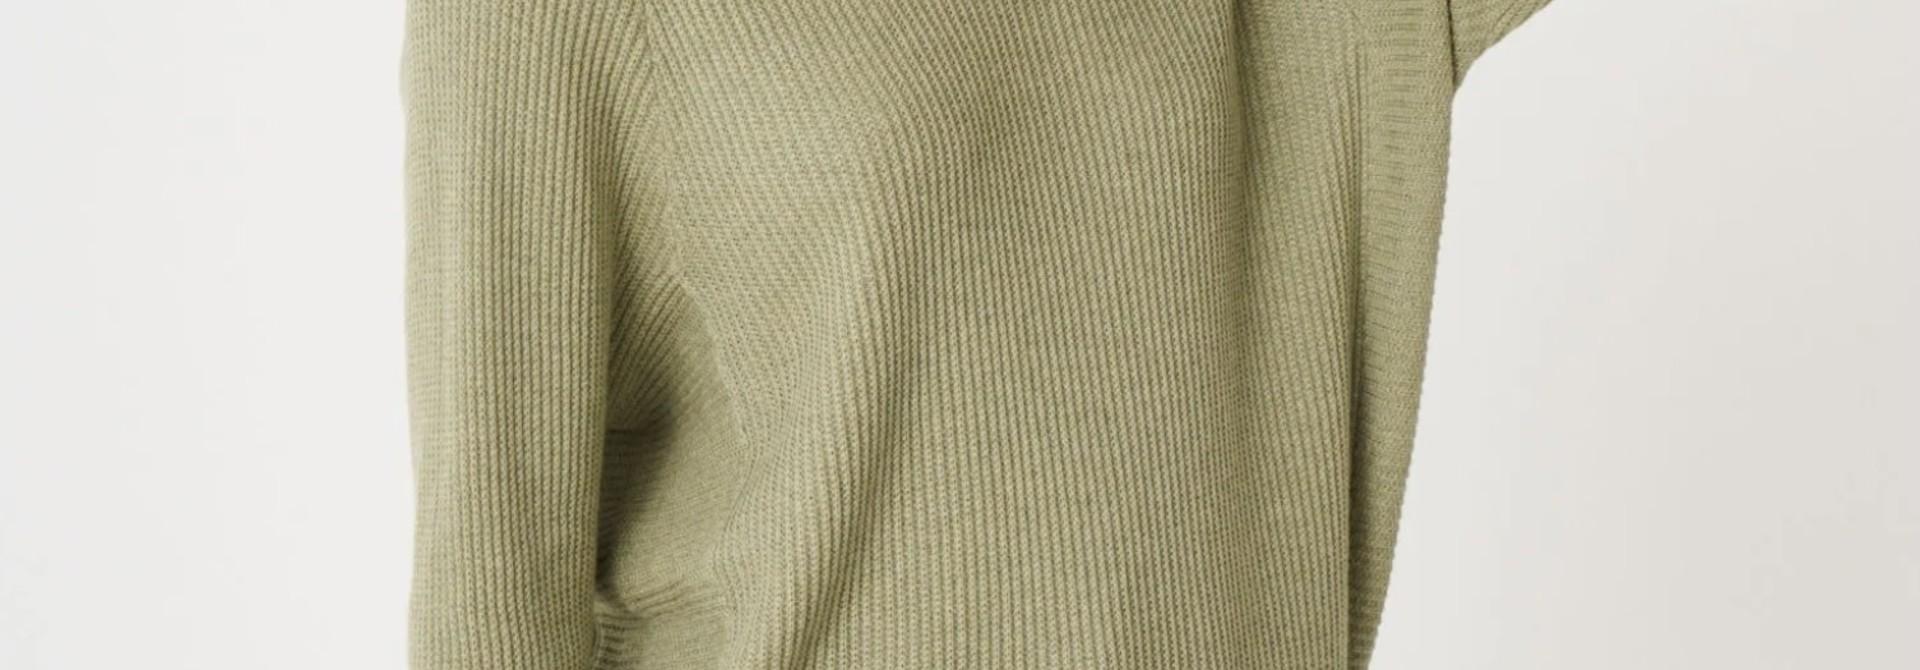 Sweater Repeat 400450